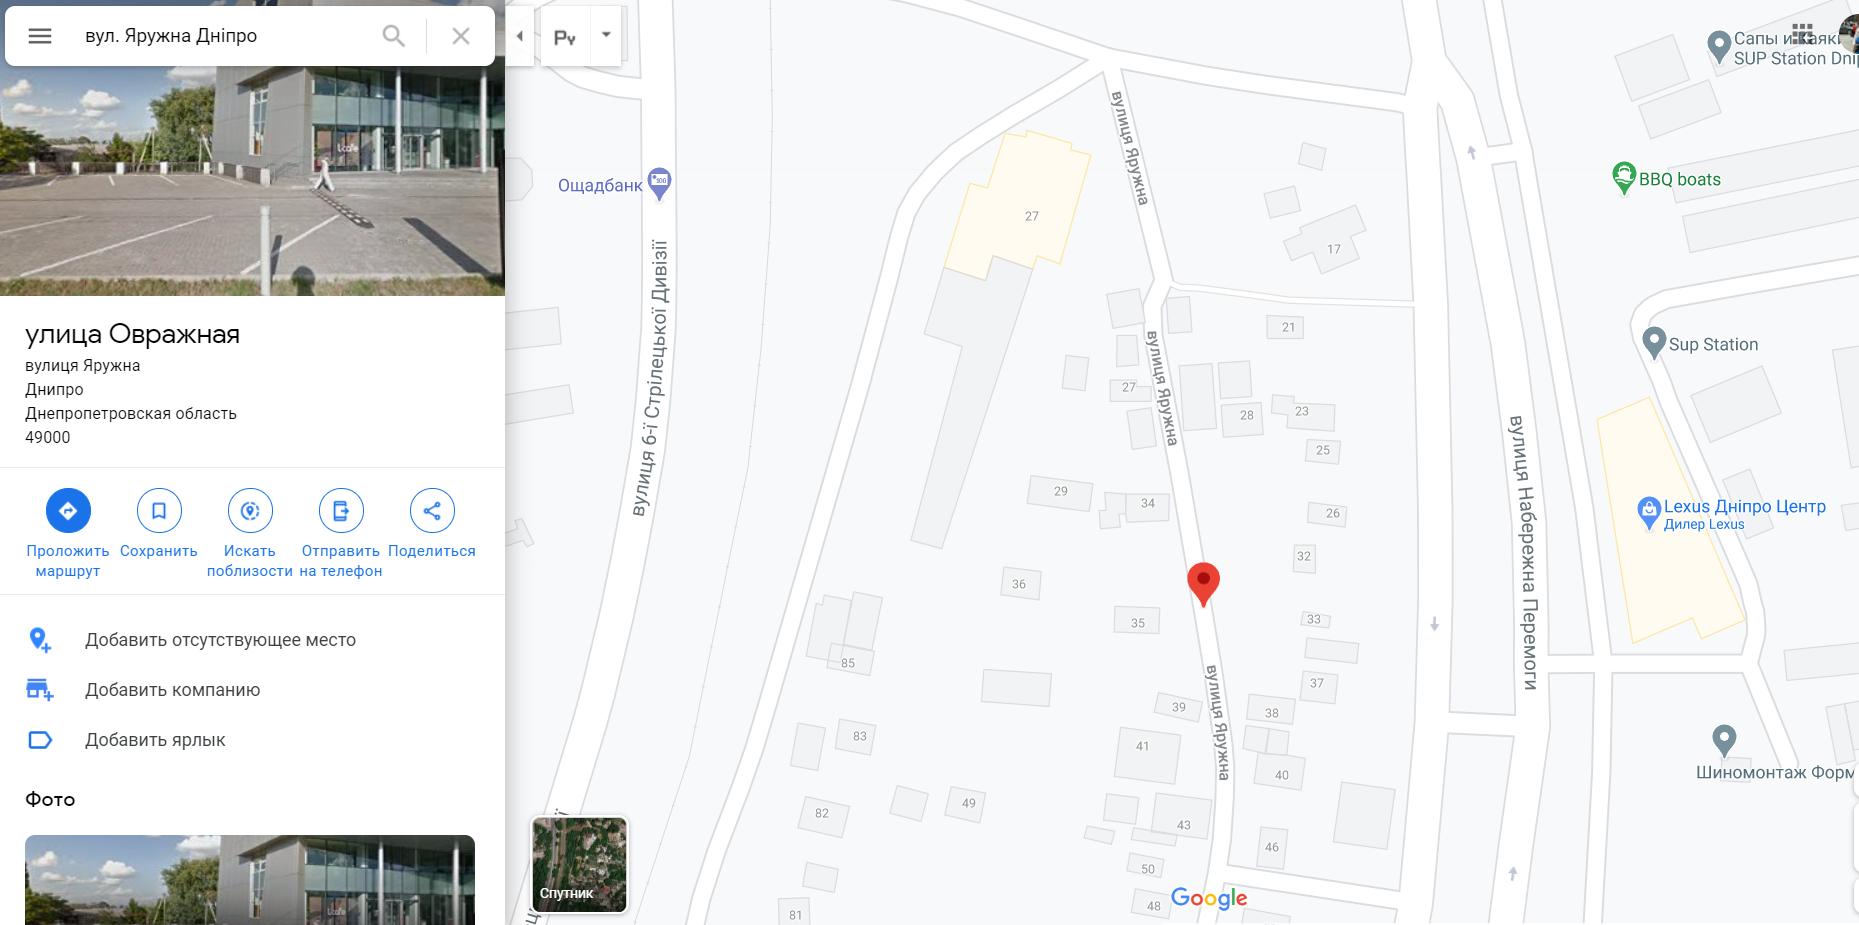 Вул. Яружна на мапі Дніпра